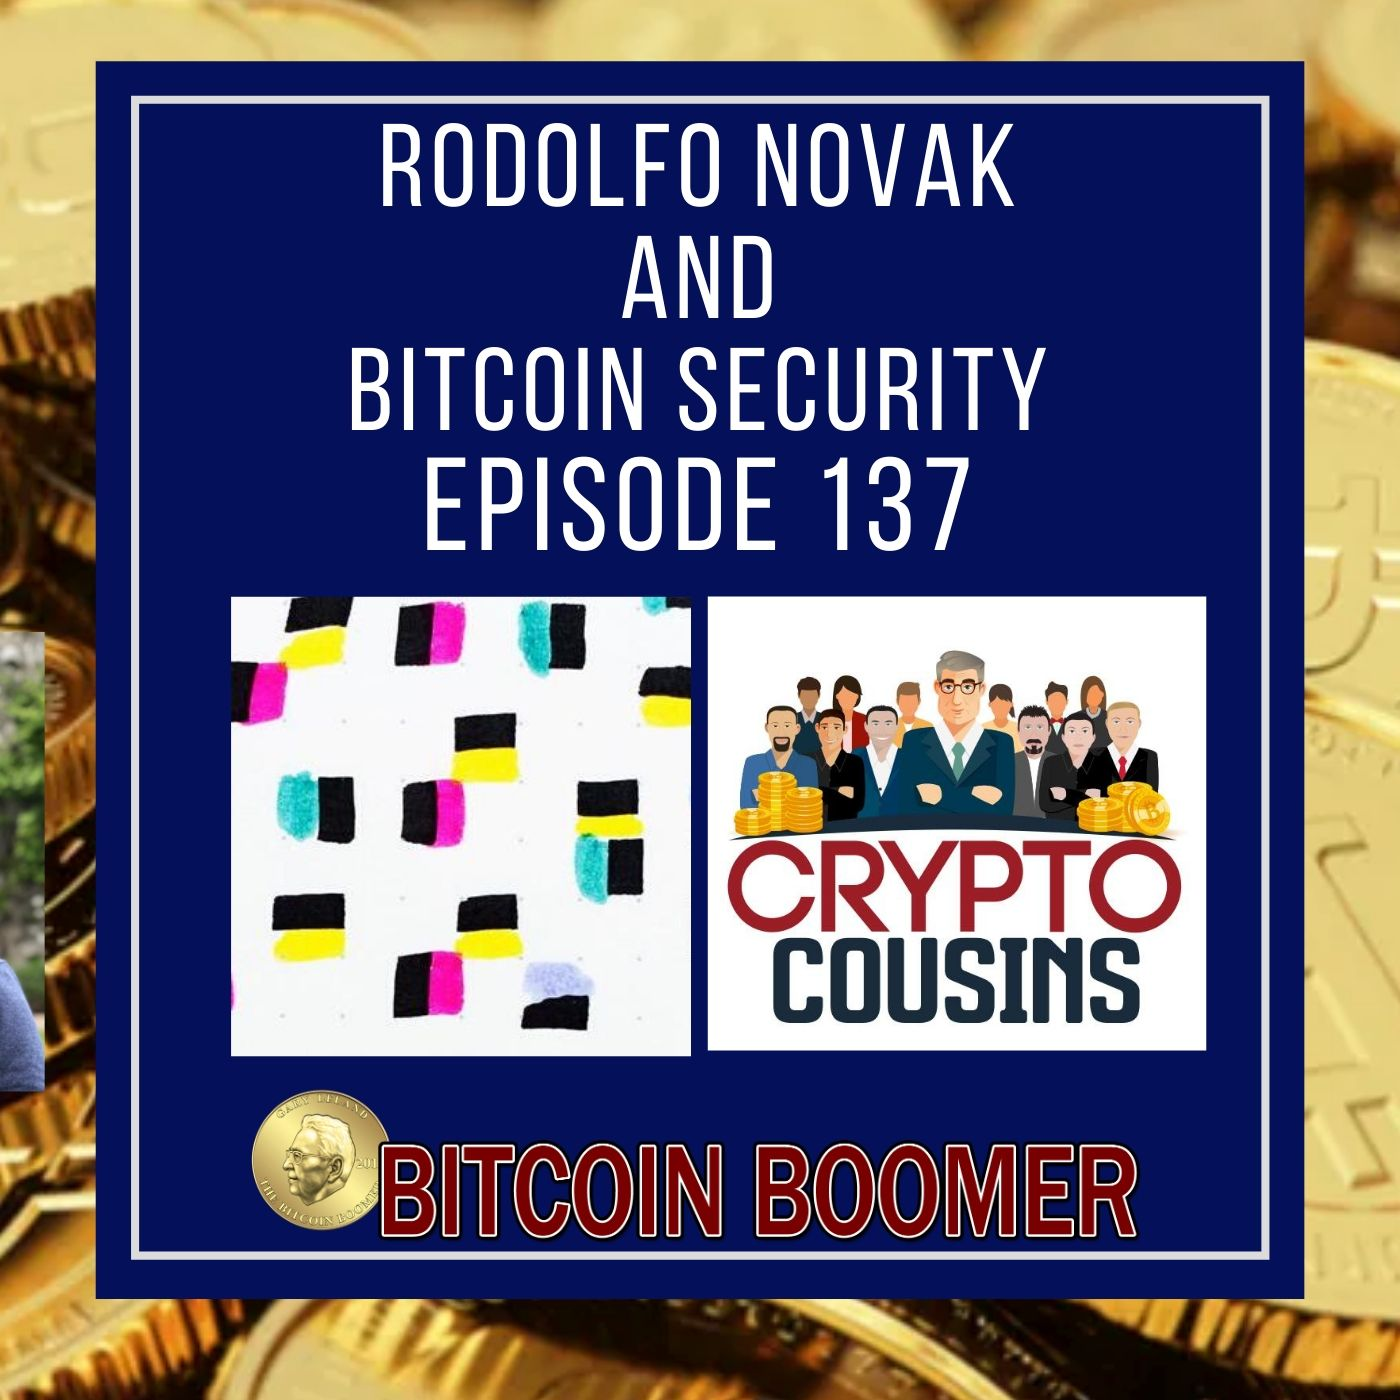 Bitcoin Security - Rodolfo Novak